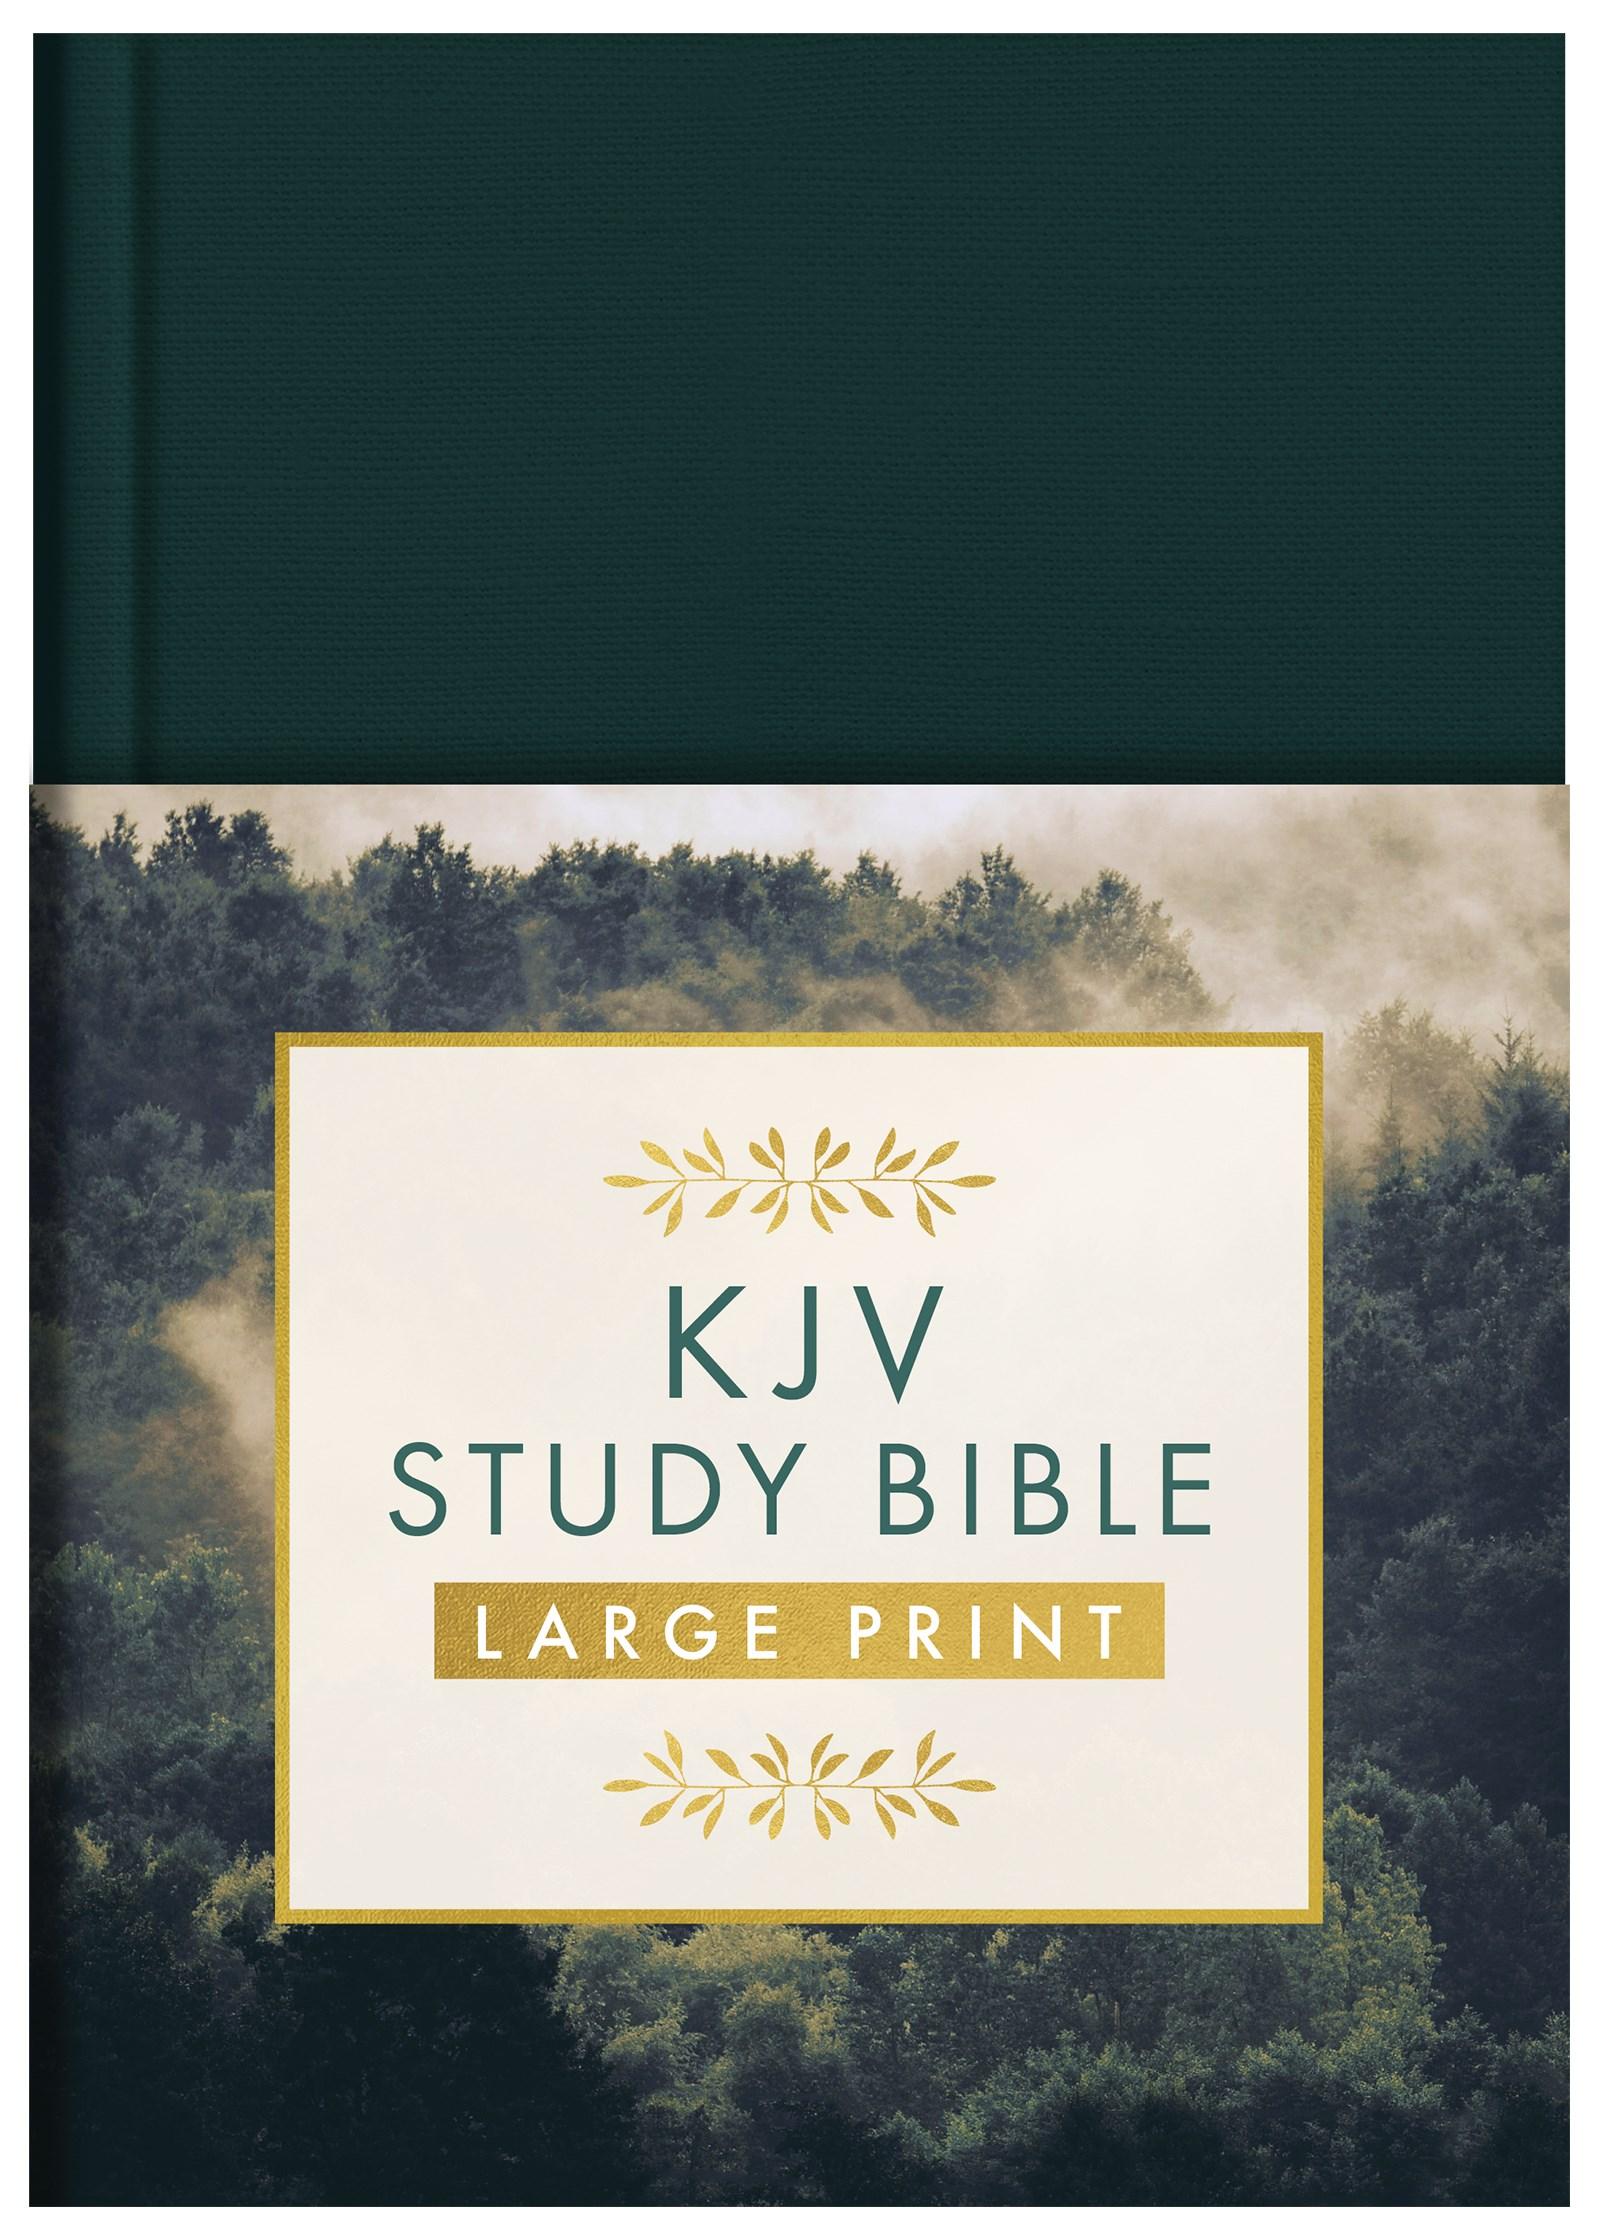 KJV Study Bible/Large Print-Gold Spruce Hardcover